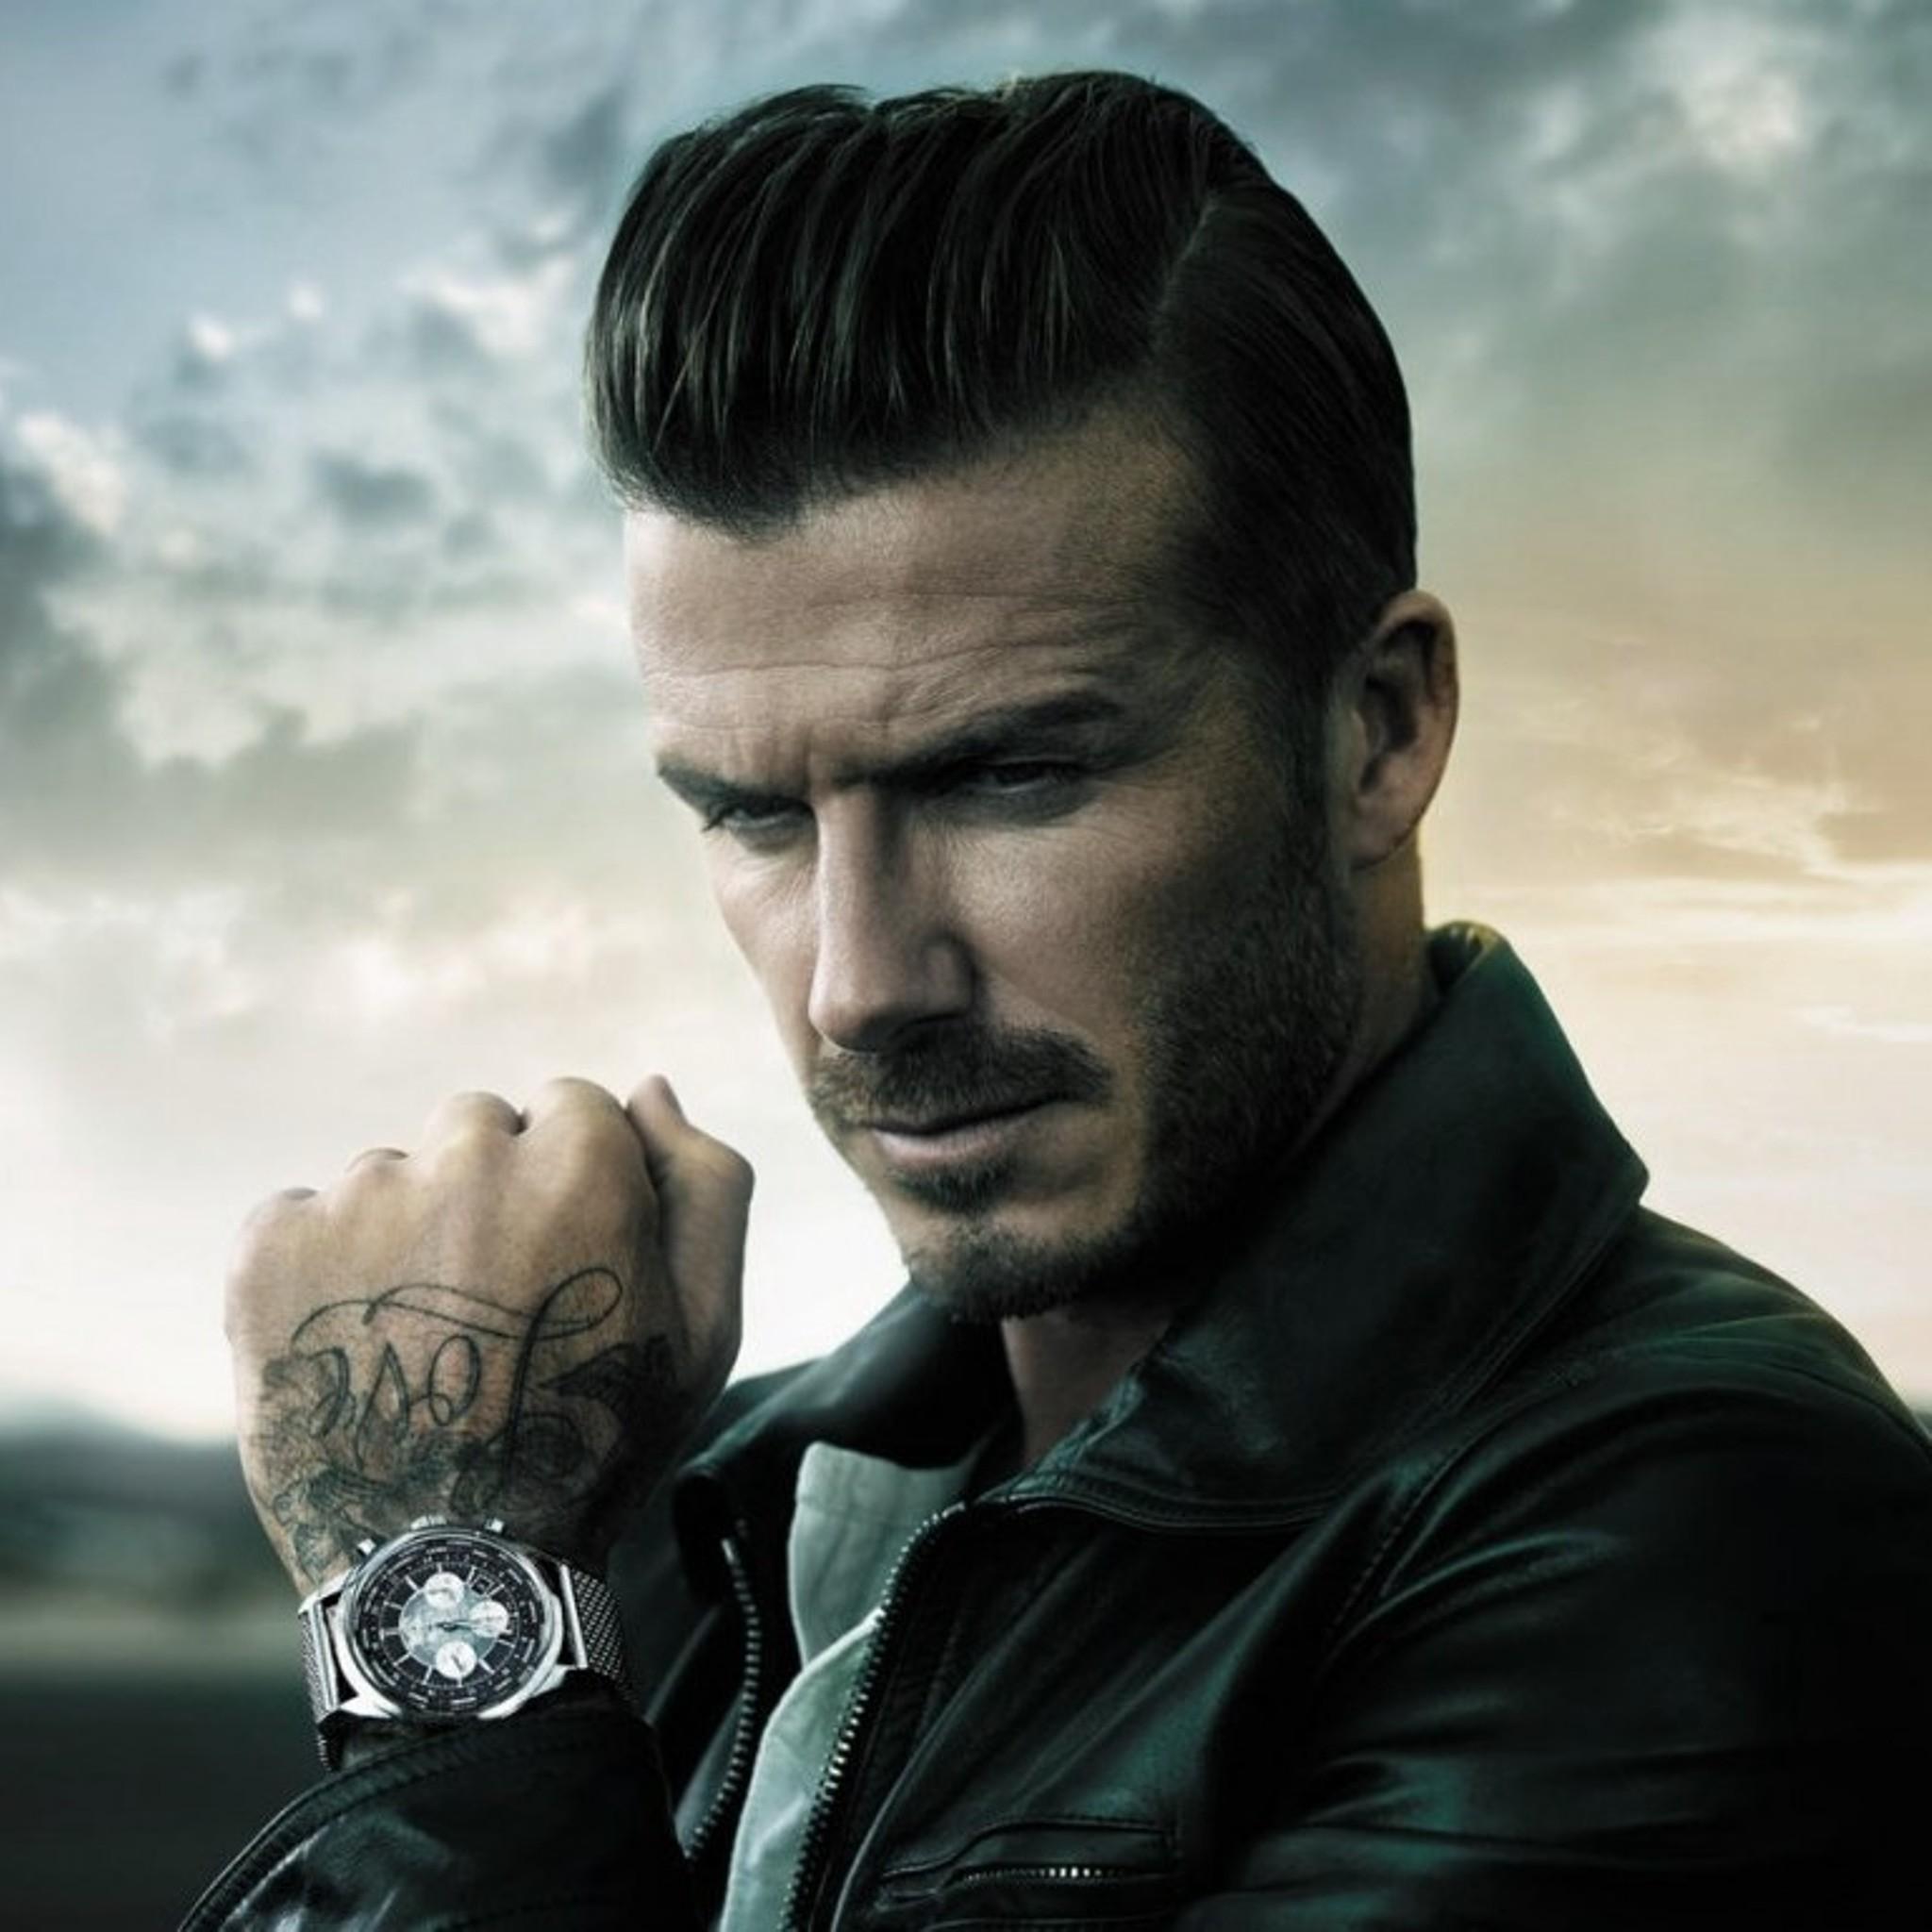 David Beckham Haircut 2013 Back David Beckham Hairstyles 2013